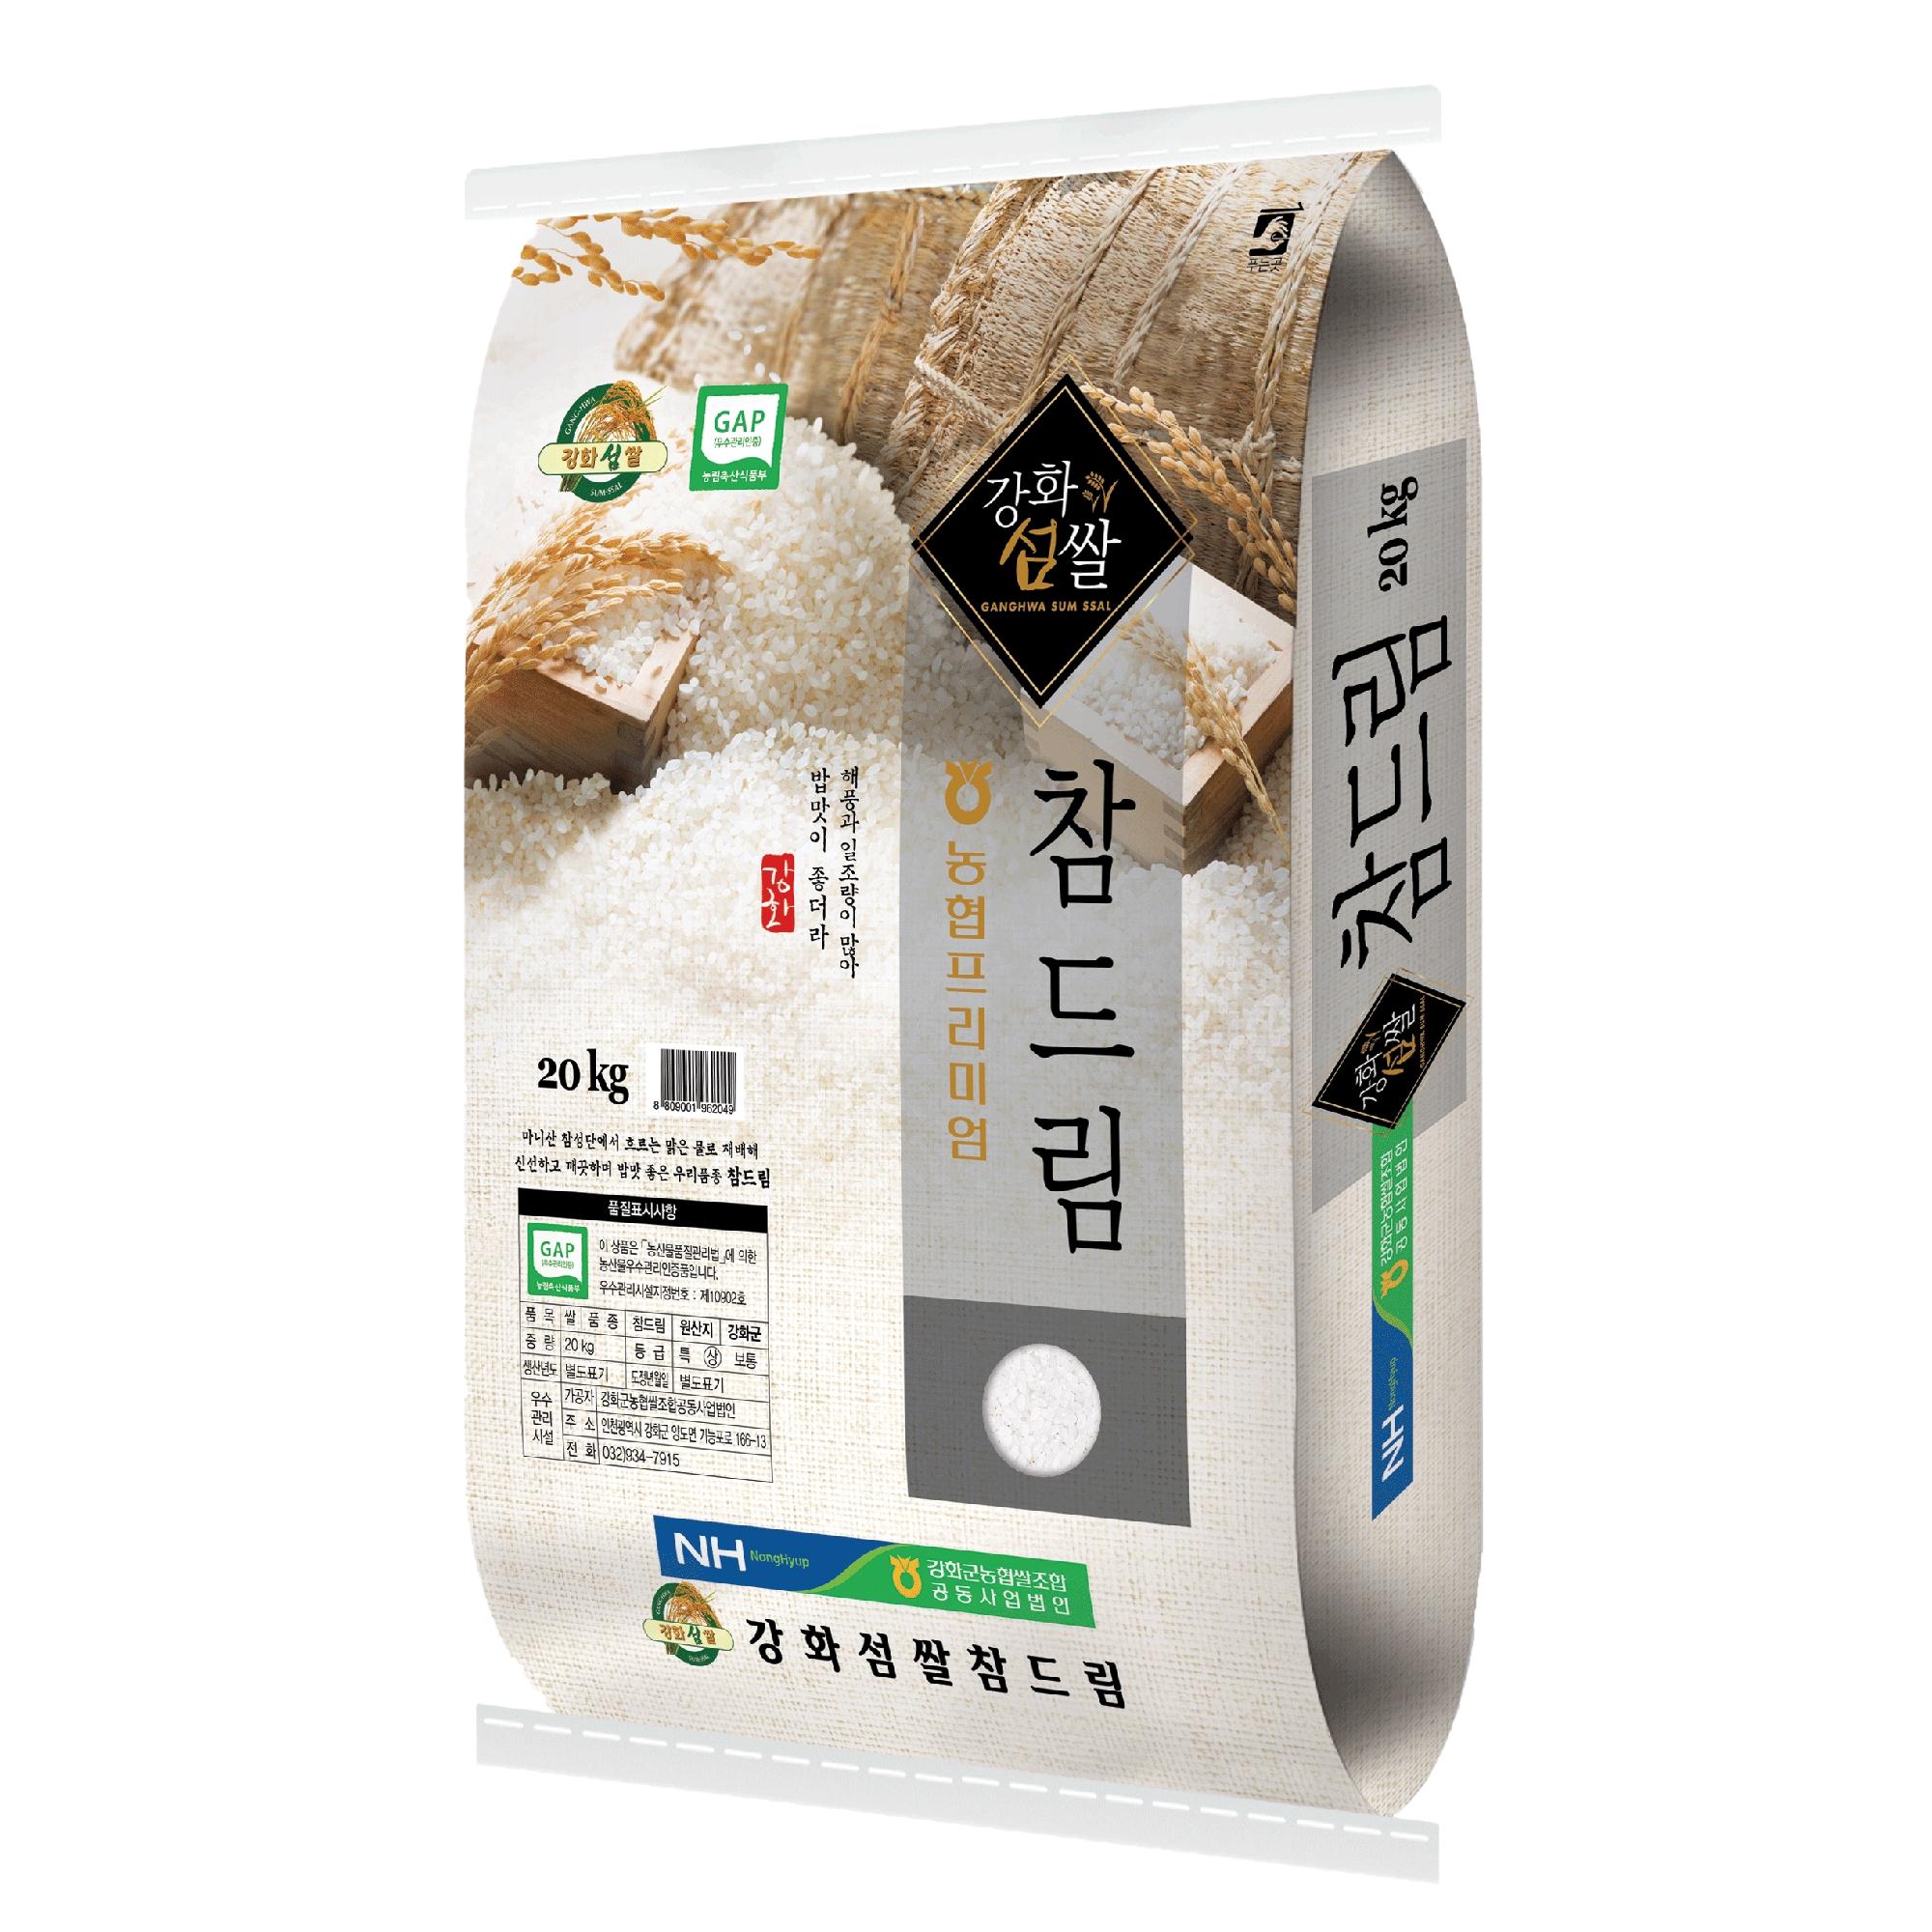 [Gold box] 강화섬쌀 참드림 백미, 20kg, 1개 - 랭킹15위 (65800원)